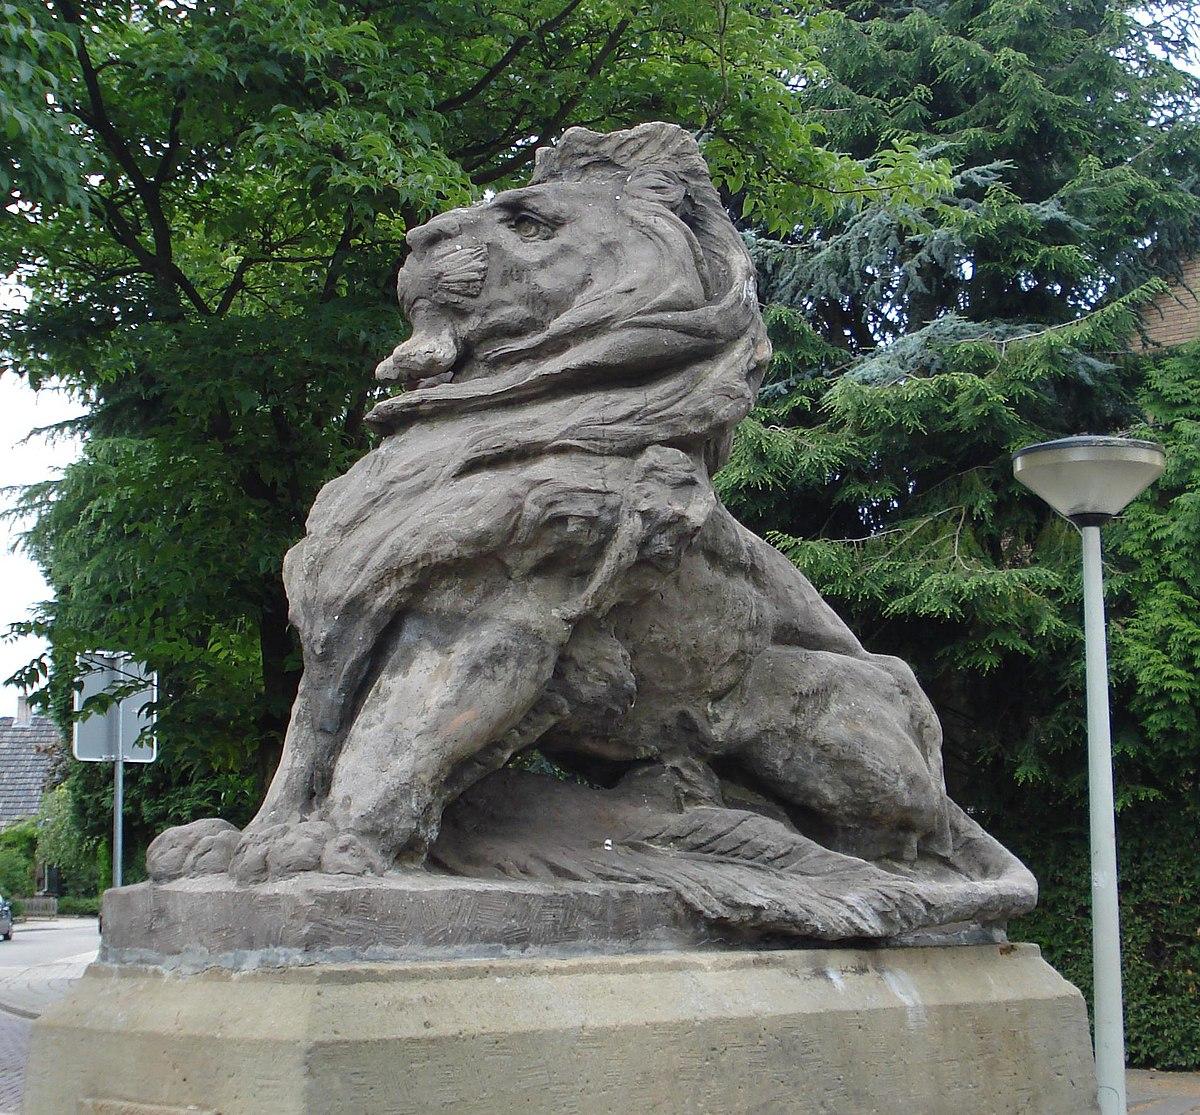 Lisa de leeuw john boland homecoming - 4 9